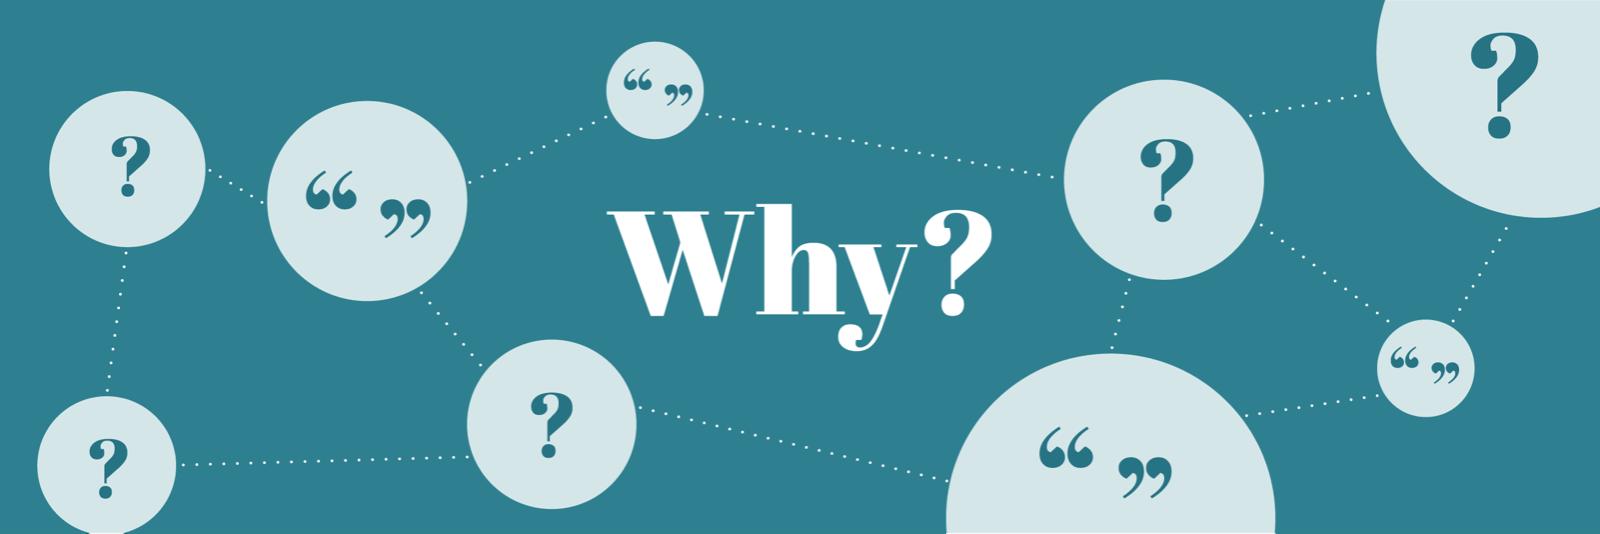 presentation mistakes why